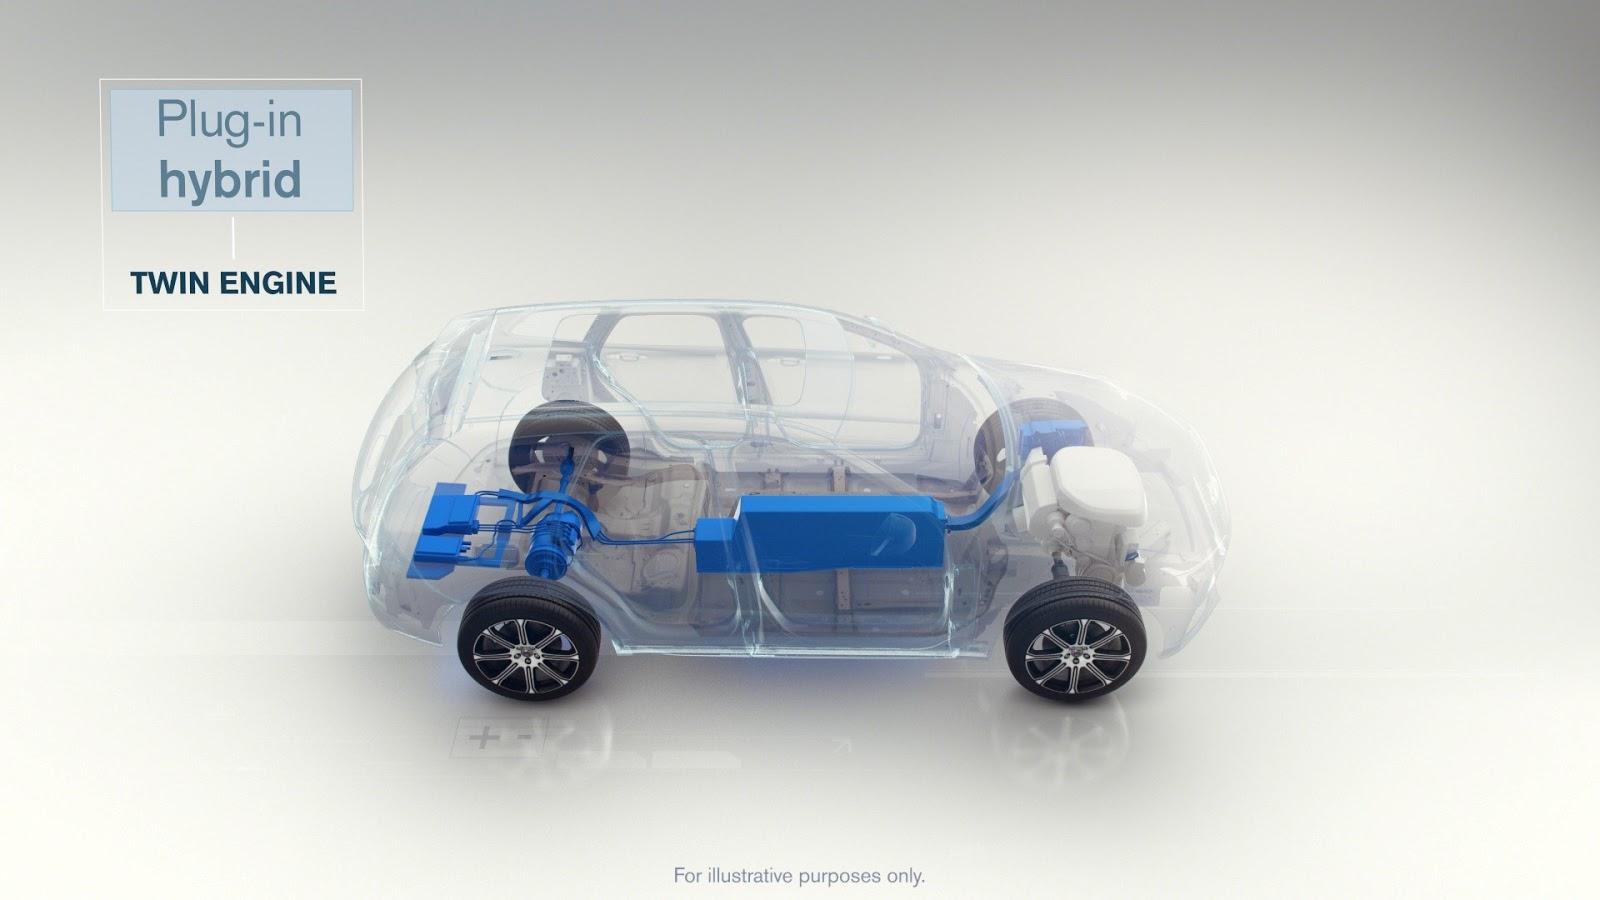 VOLVO TWIN2BENGINE PLUG IN2BHYBRID Από το 2019, όλα τα Volvo θα έχουν ηλεκτροκινητήρα Hybrid, Volvo, zblog, καινούργιο, καινούρια, υβριδικό